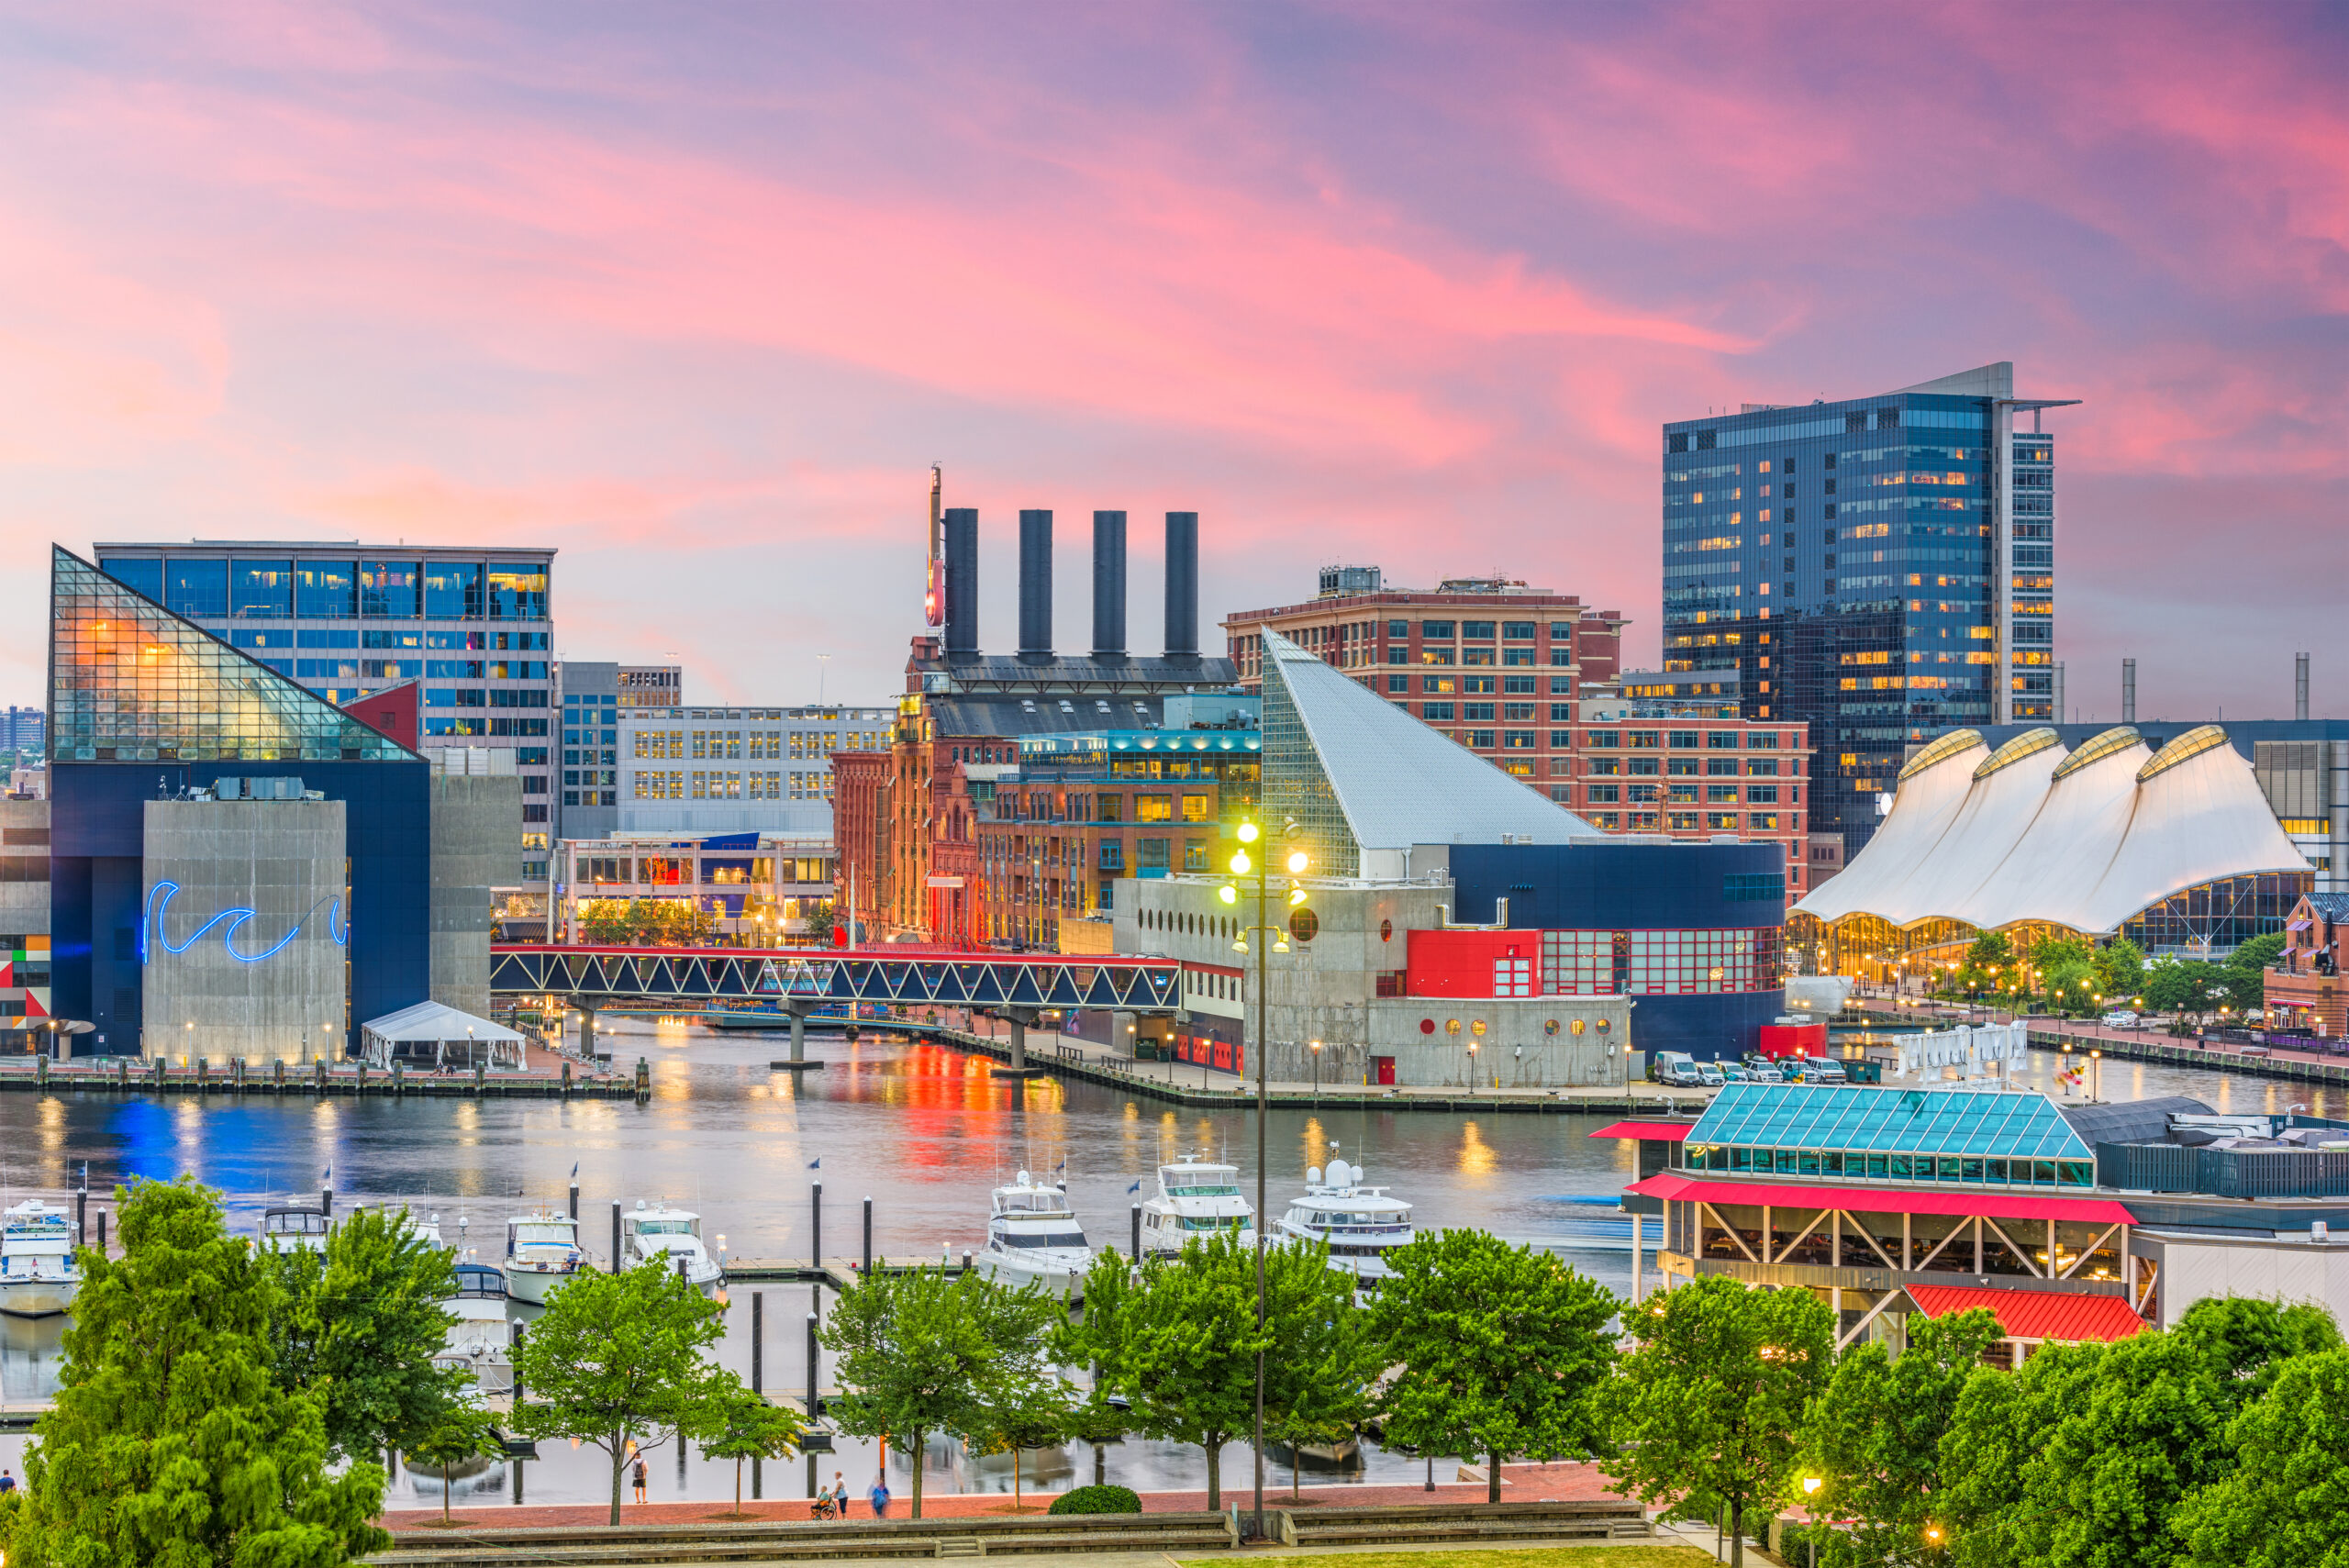 Baltimore, Maryland, USA Skyline over the Inner Harbor at dusk.